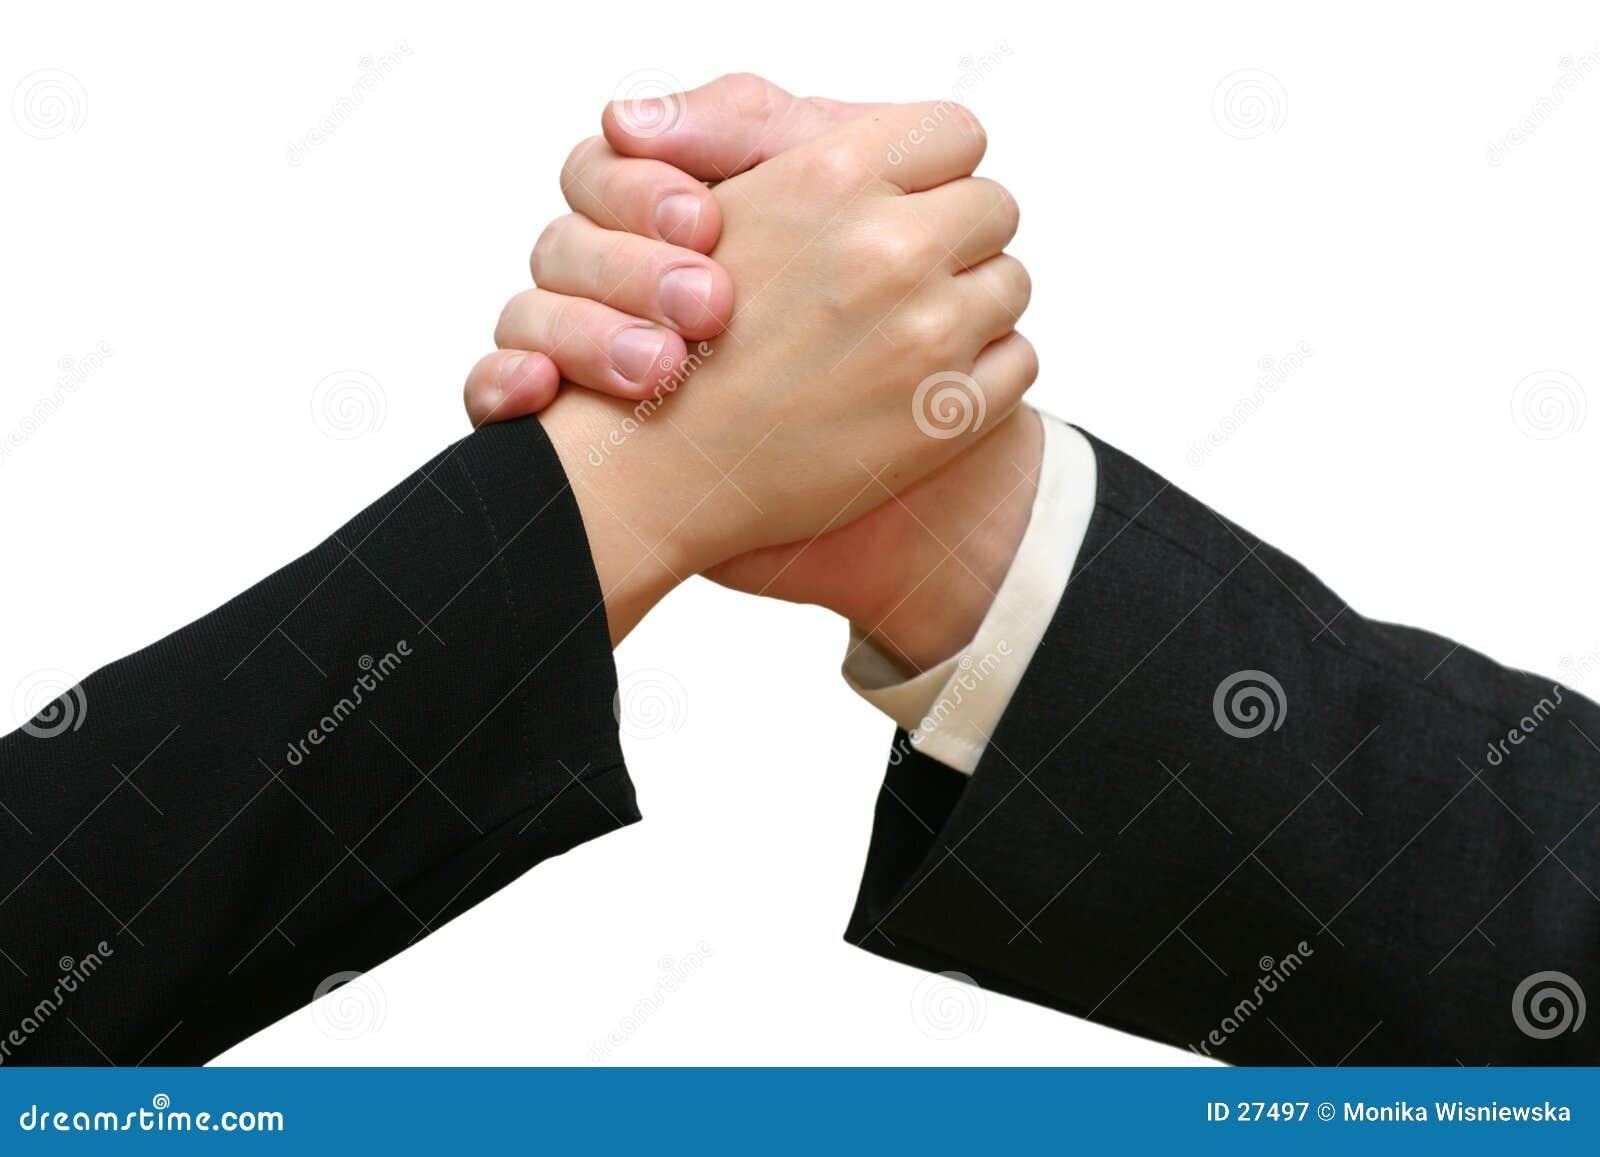 Great Job! - Handshake